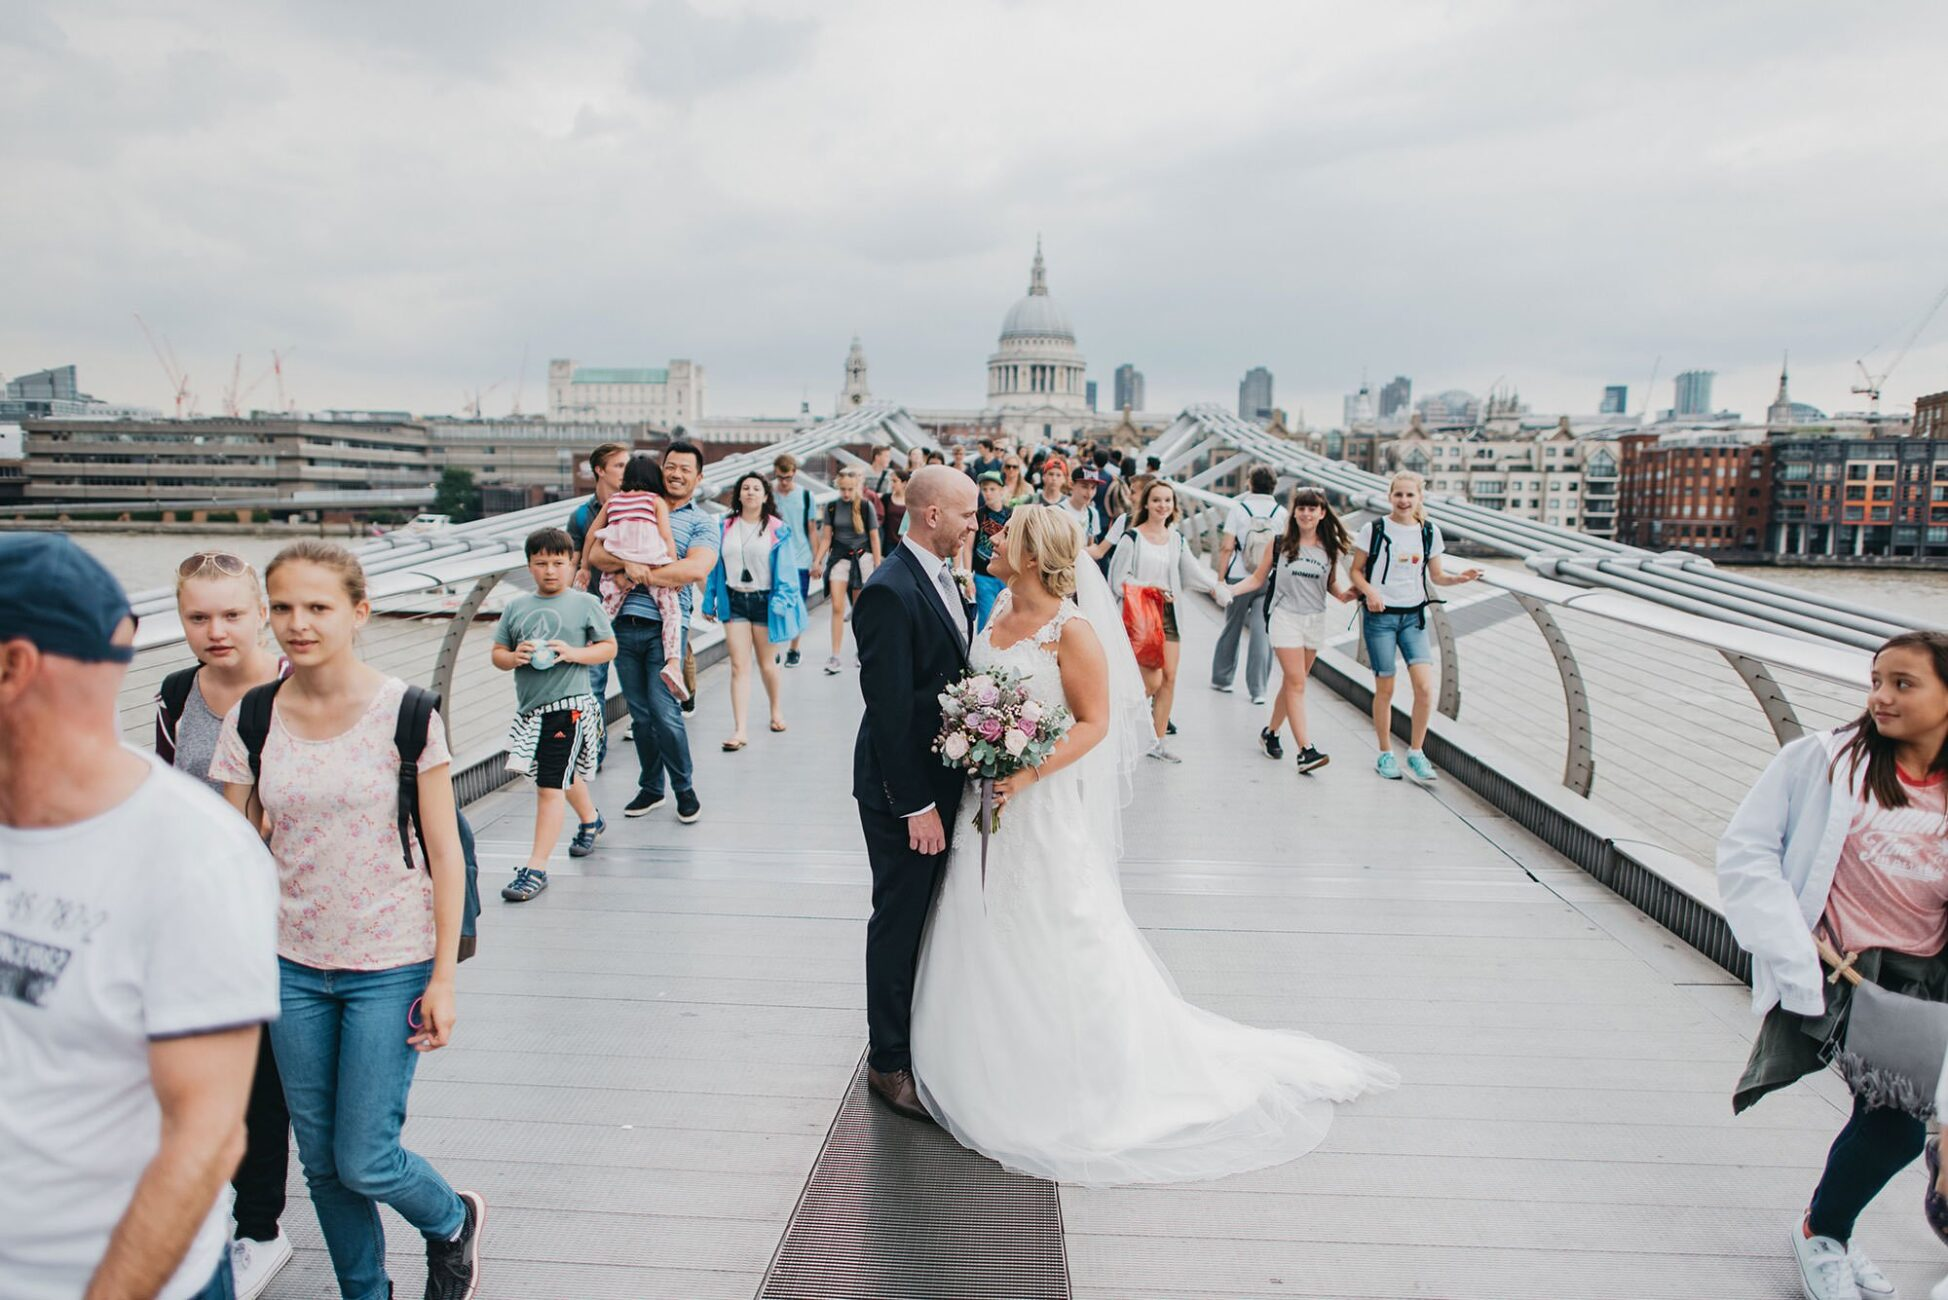 bride and groom on millennium bride london